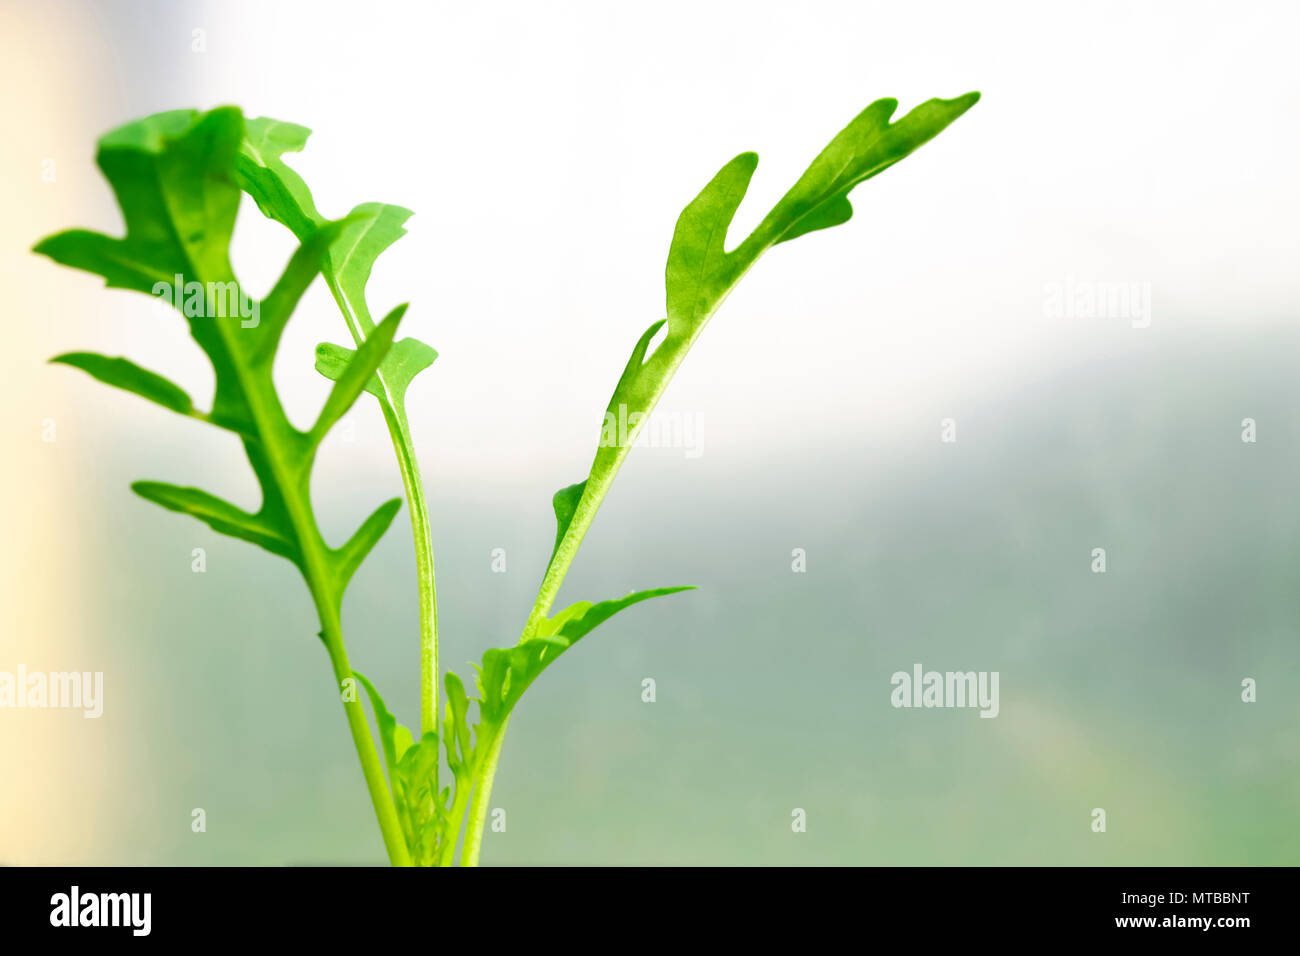 Rucola leaves macro shot on soft blurry background - Stock Image